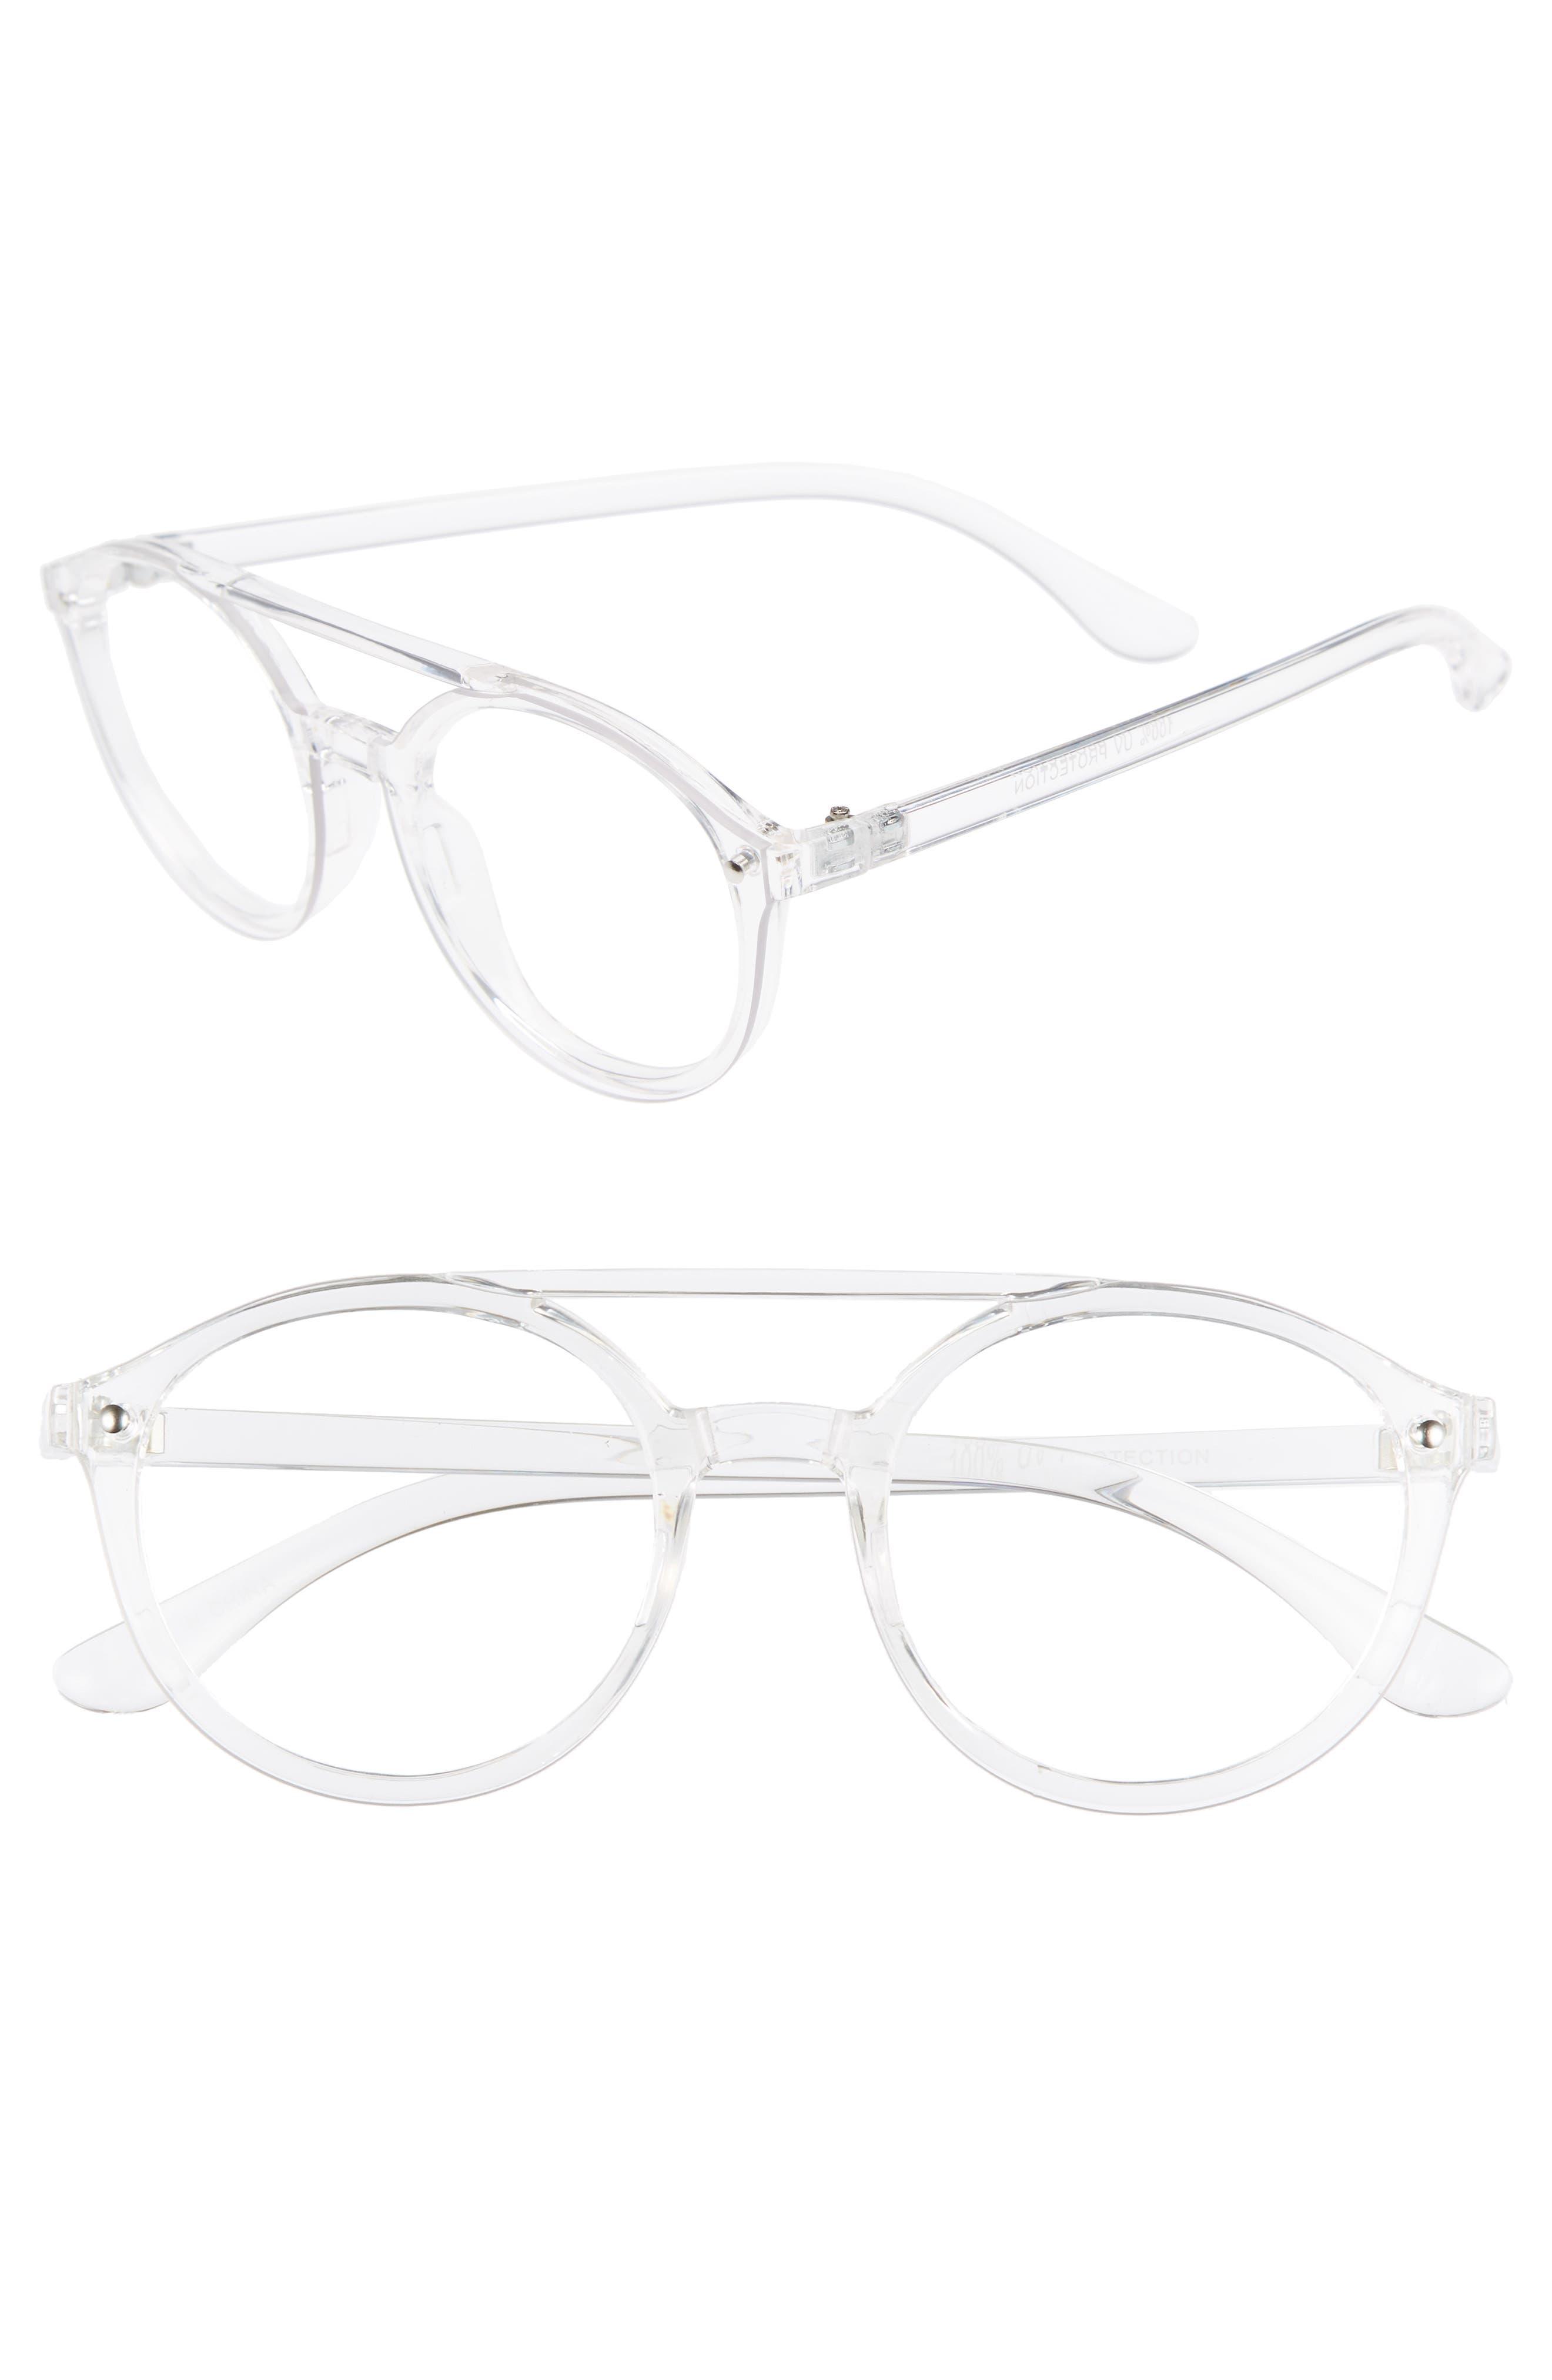 54mm Aviator Fashion Glasses,                         Main,                         color, CLEAR